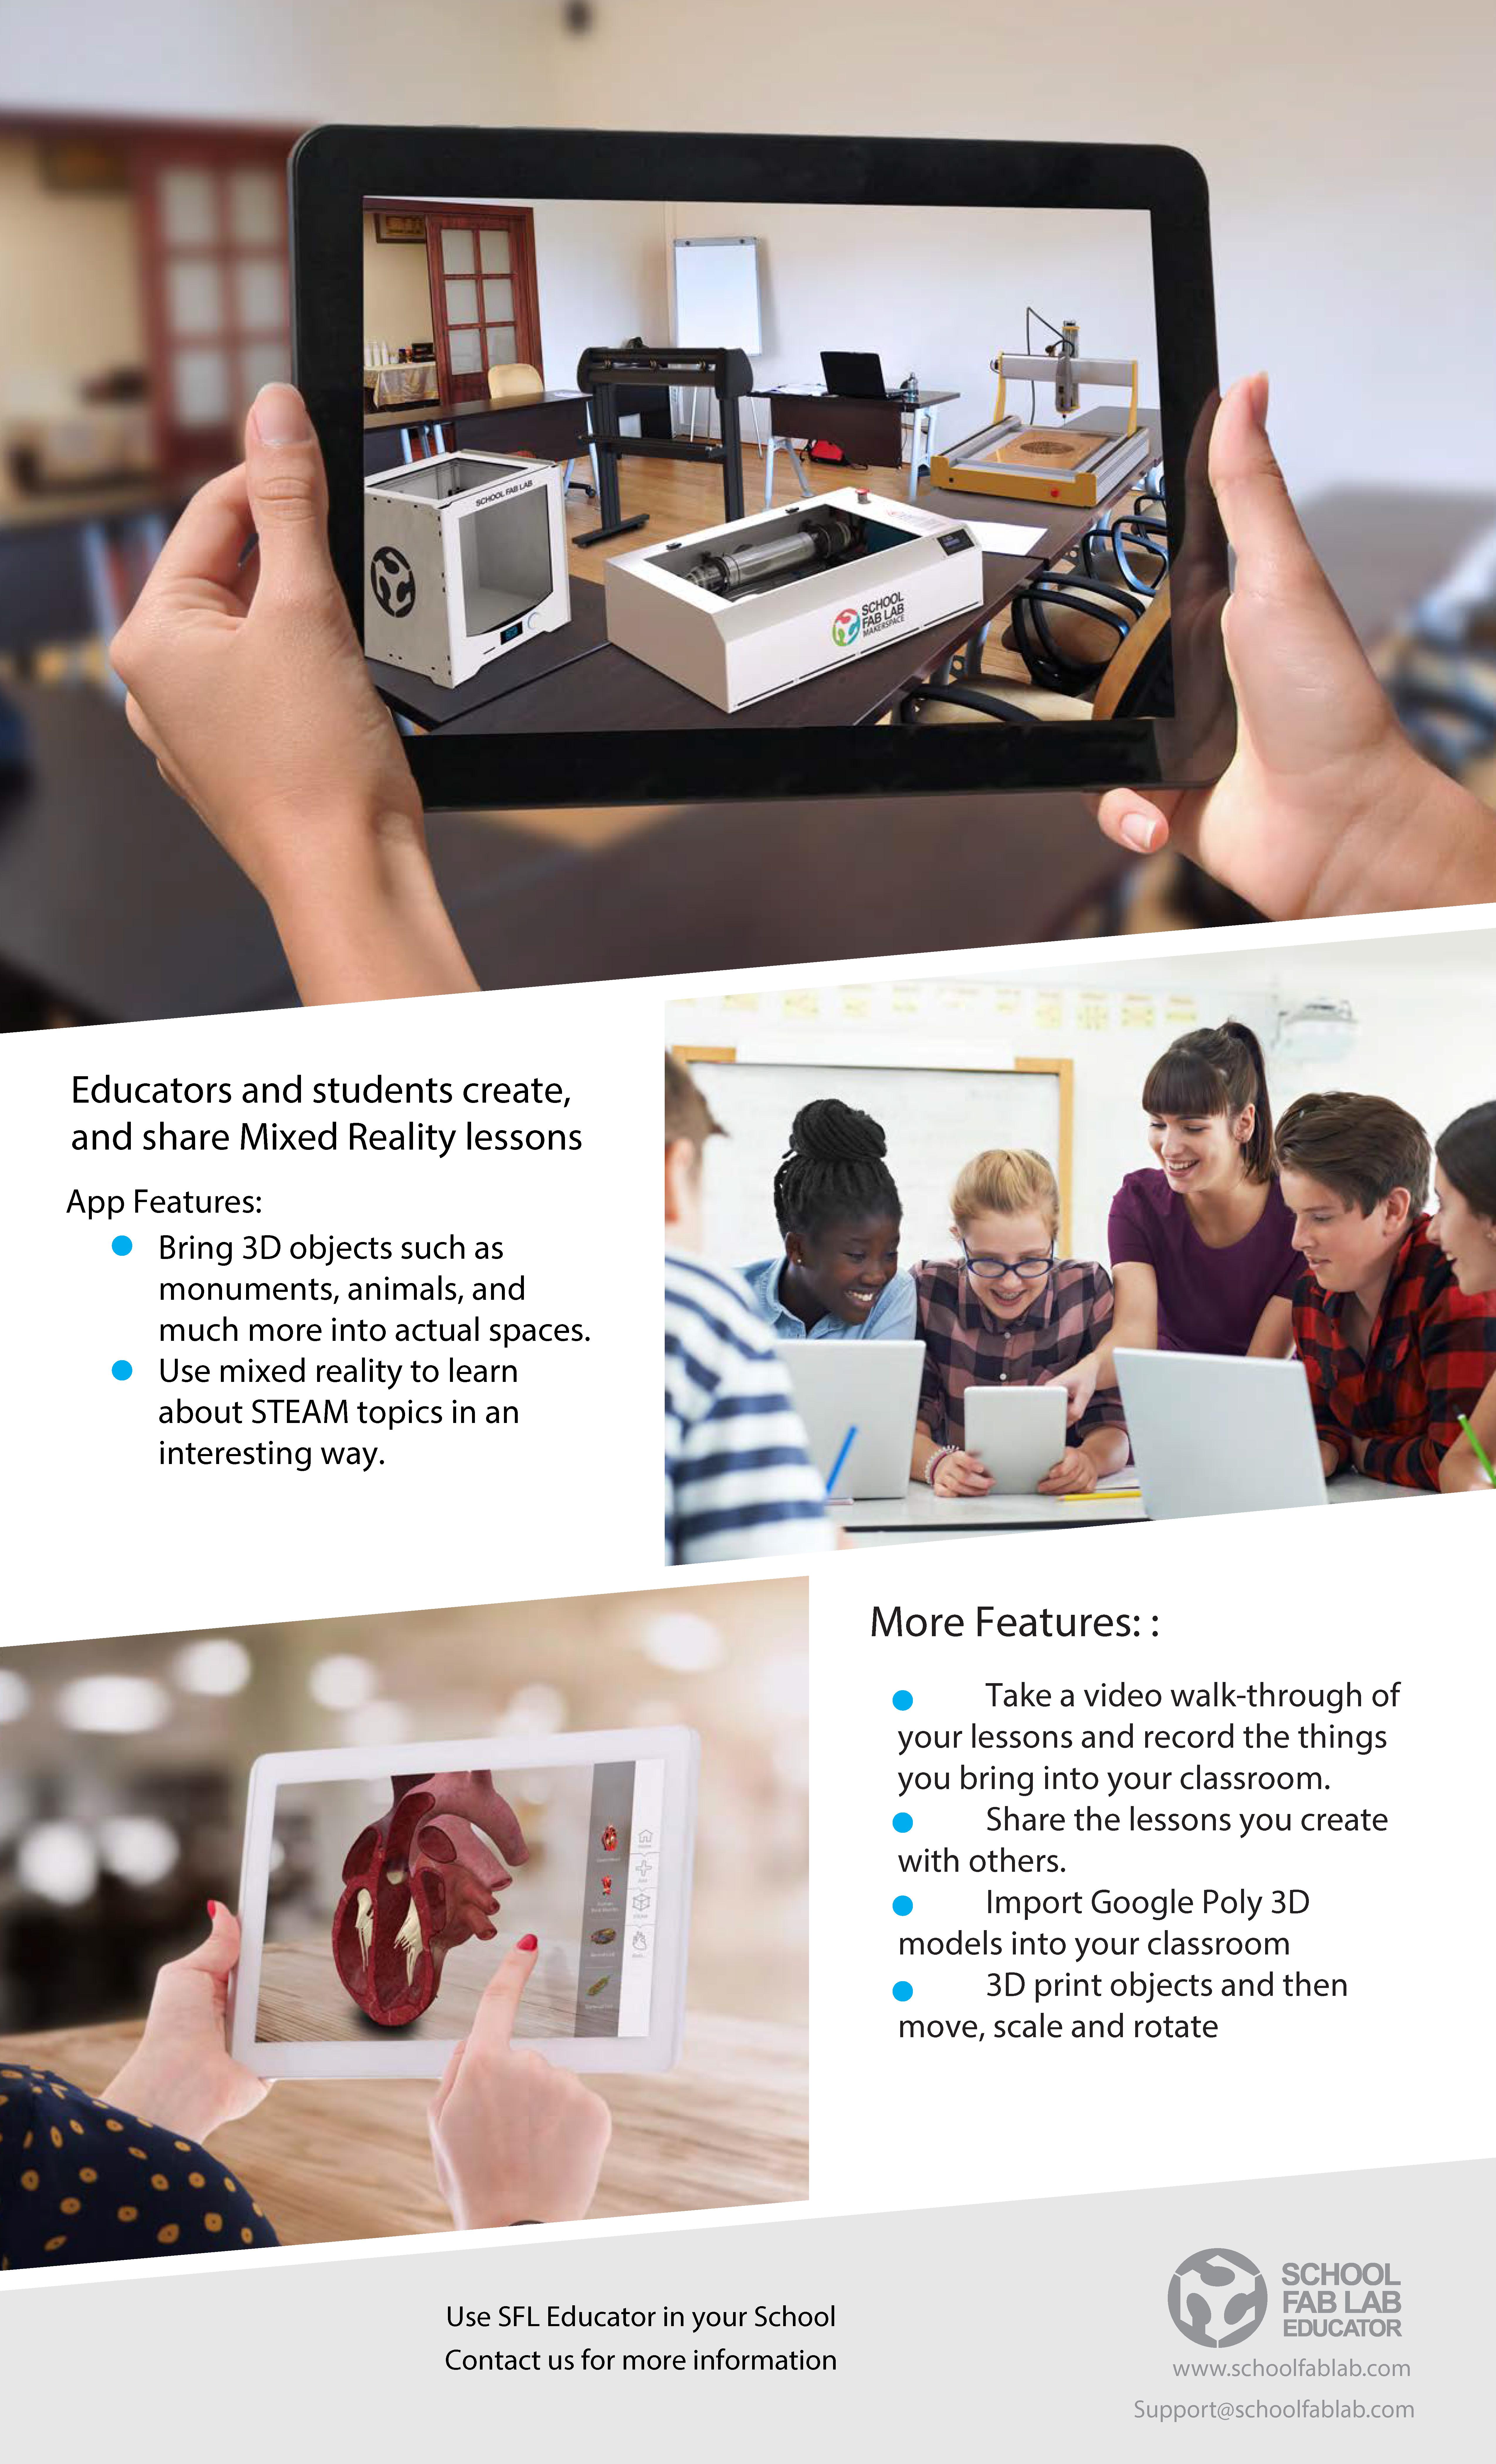 School Fab Lab Educator App